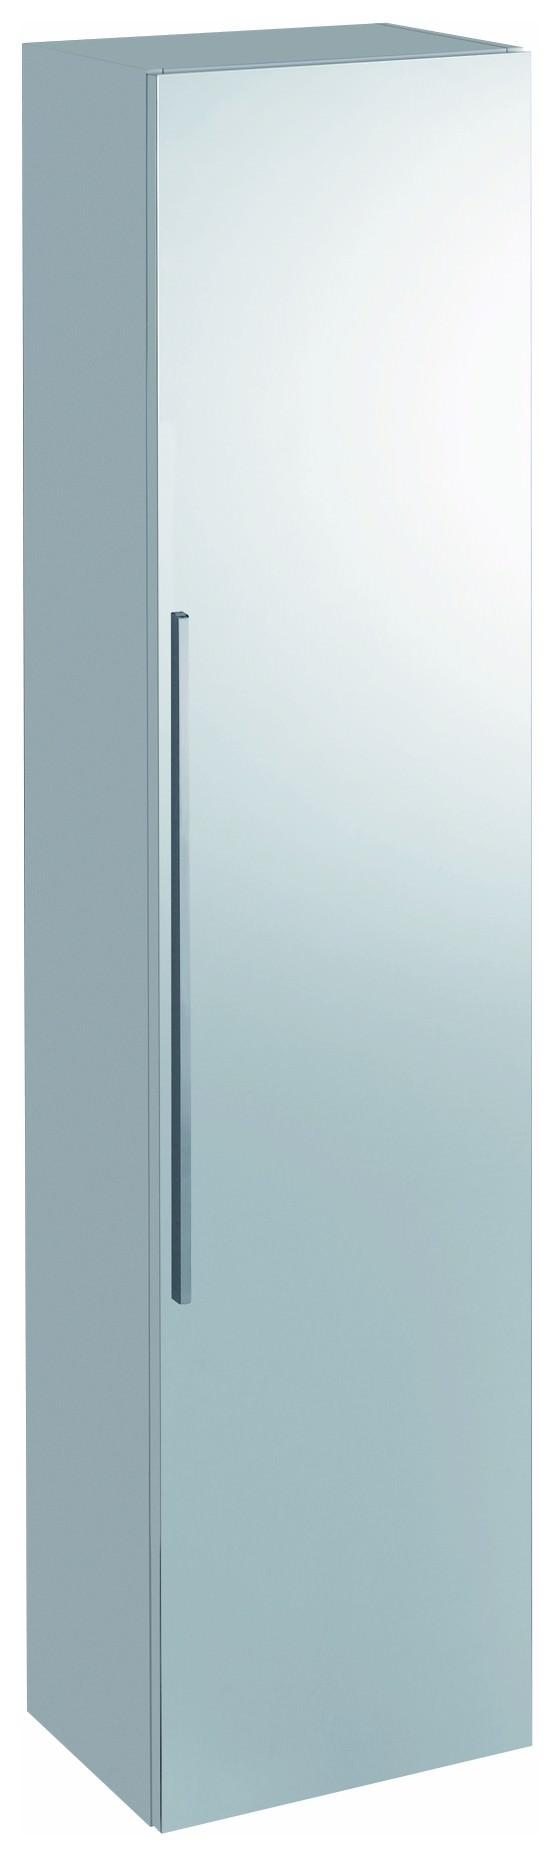 keramag icon spiegelschrank 360mm x 1800mm x 309mm alpin hochglanz 840150000. Black Bedroom Furniture Sets. Home Design Ideas